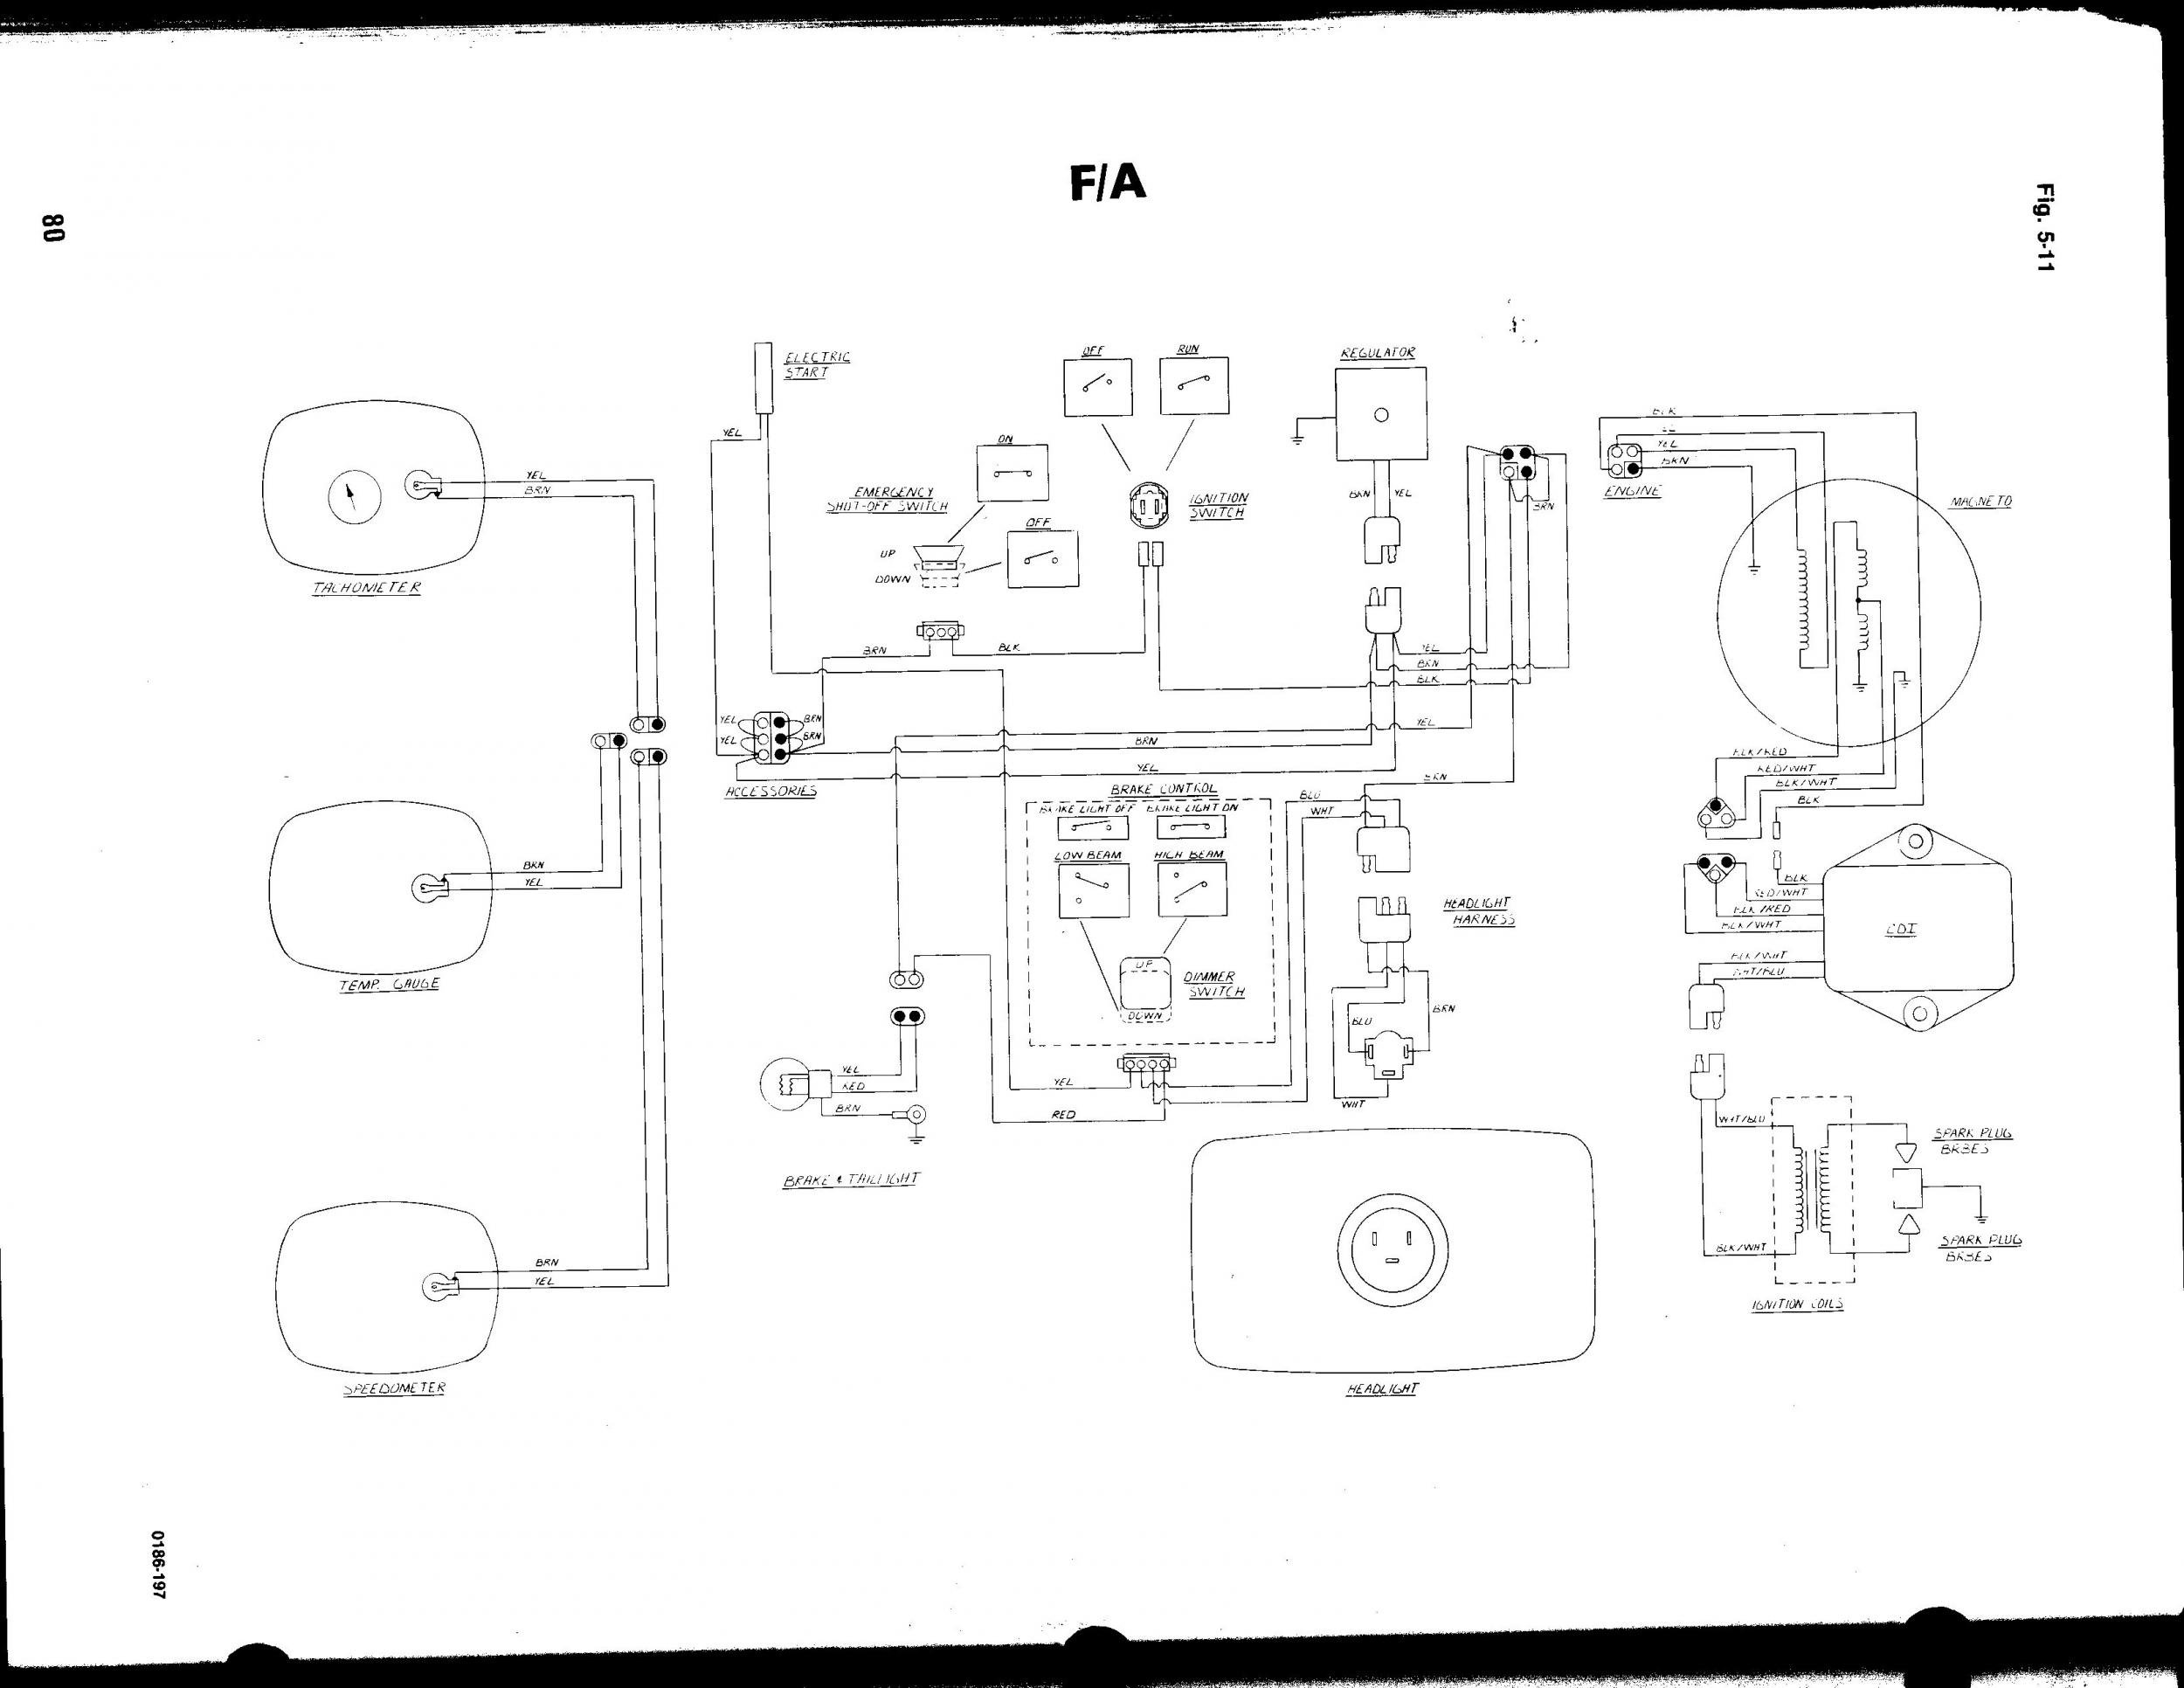 DIAGRAM] Artic Cat Jag Wiring Diagram For 1979 FULL Version HD Quality For  1979 - AIRCOOLEDDIAGRAMS.CLUB-RONSARD.FR FREE Diagram Database - Club Ronsard